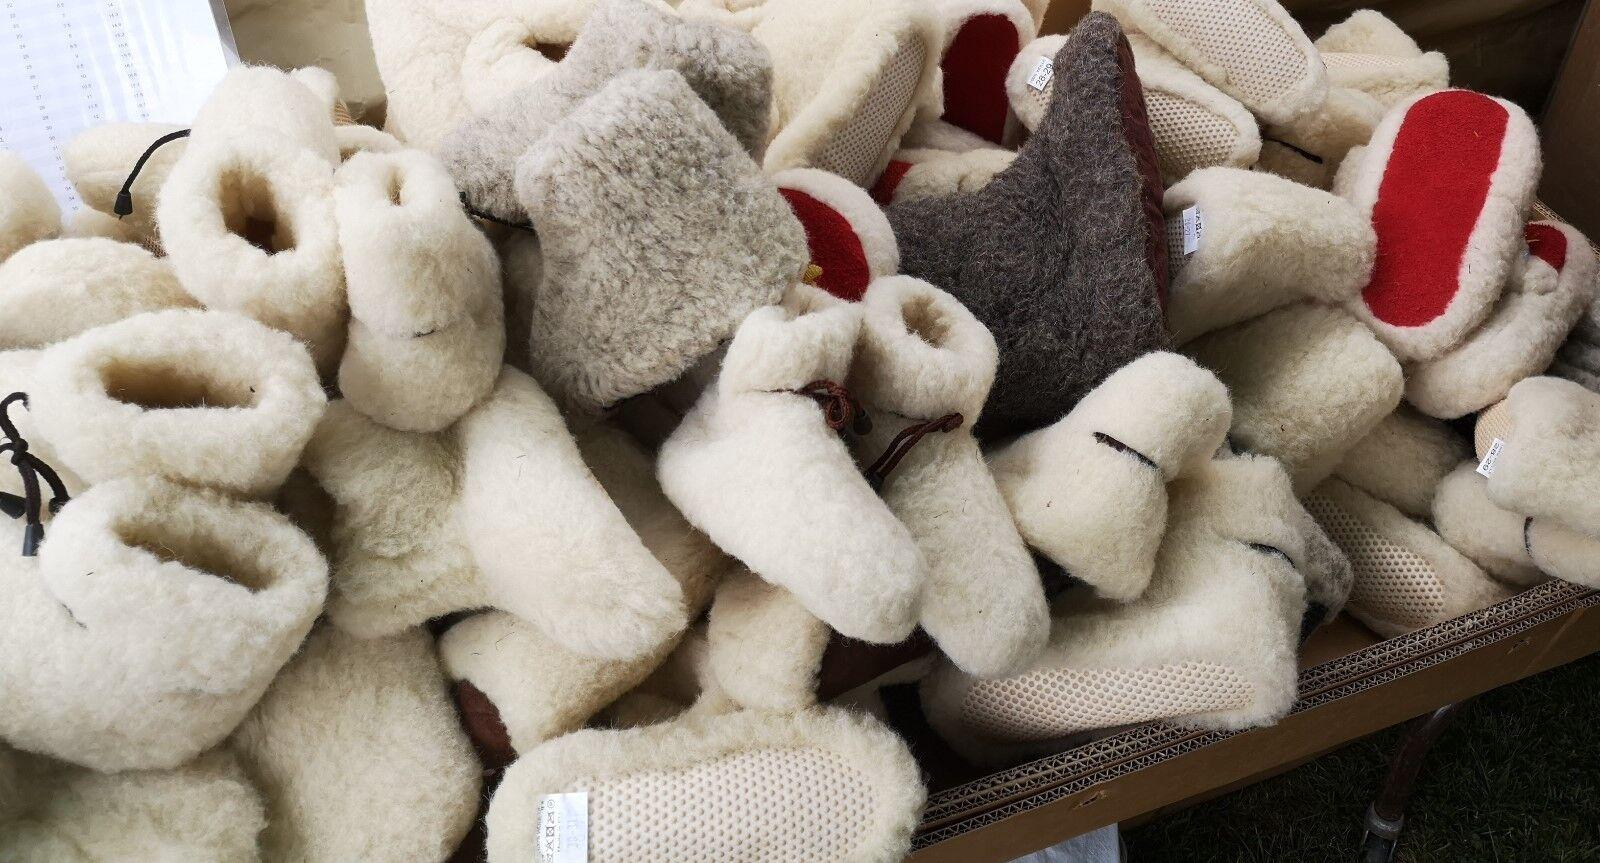 Lote De Trabajo 50+ pares de lana pura Zapatillas botas Antideslizante Chuni Hombres Mujeres Lana Sexo